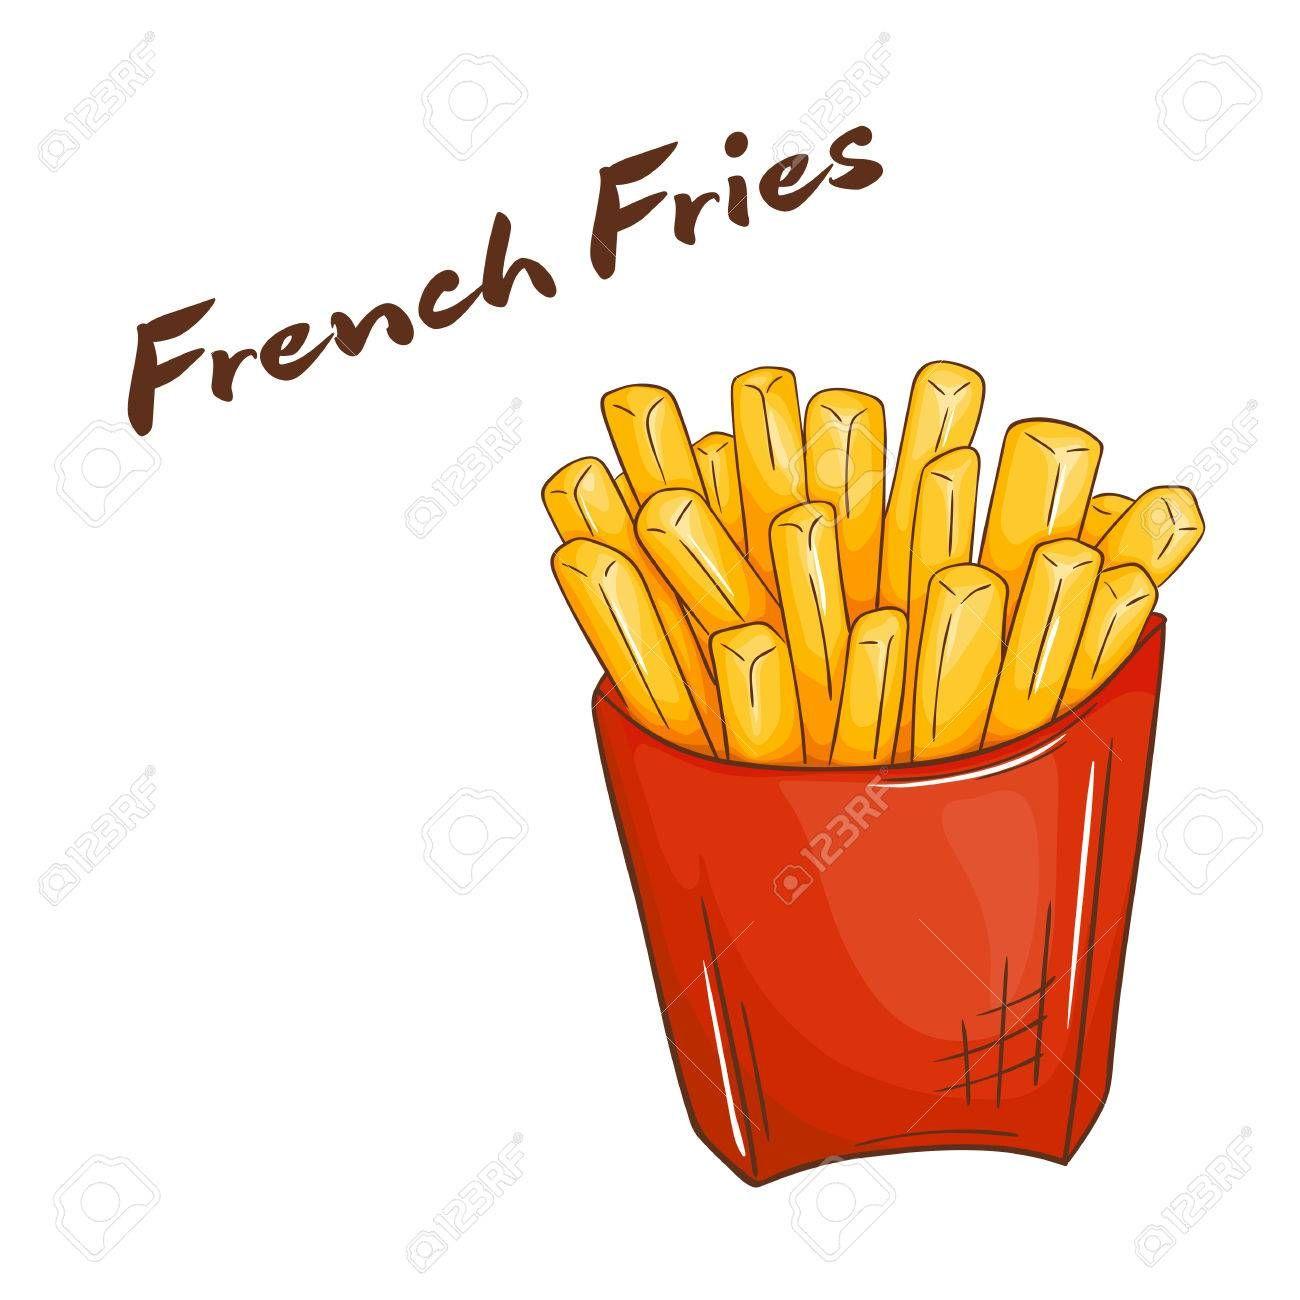 Vector Illustration Of Isolated Cartoon Hand Drawn Fast Food French Fries Ad Cartoon Hand Isolated Vector Il Makanan Makanan Dan Minuman Kentang